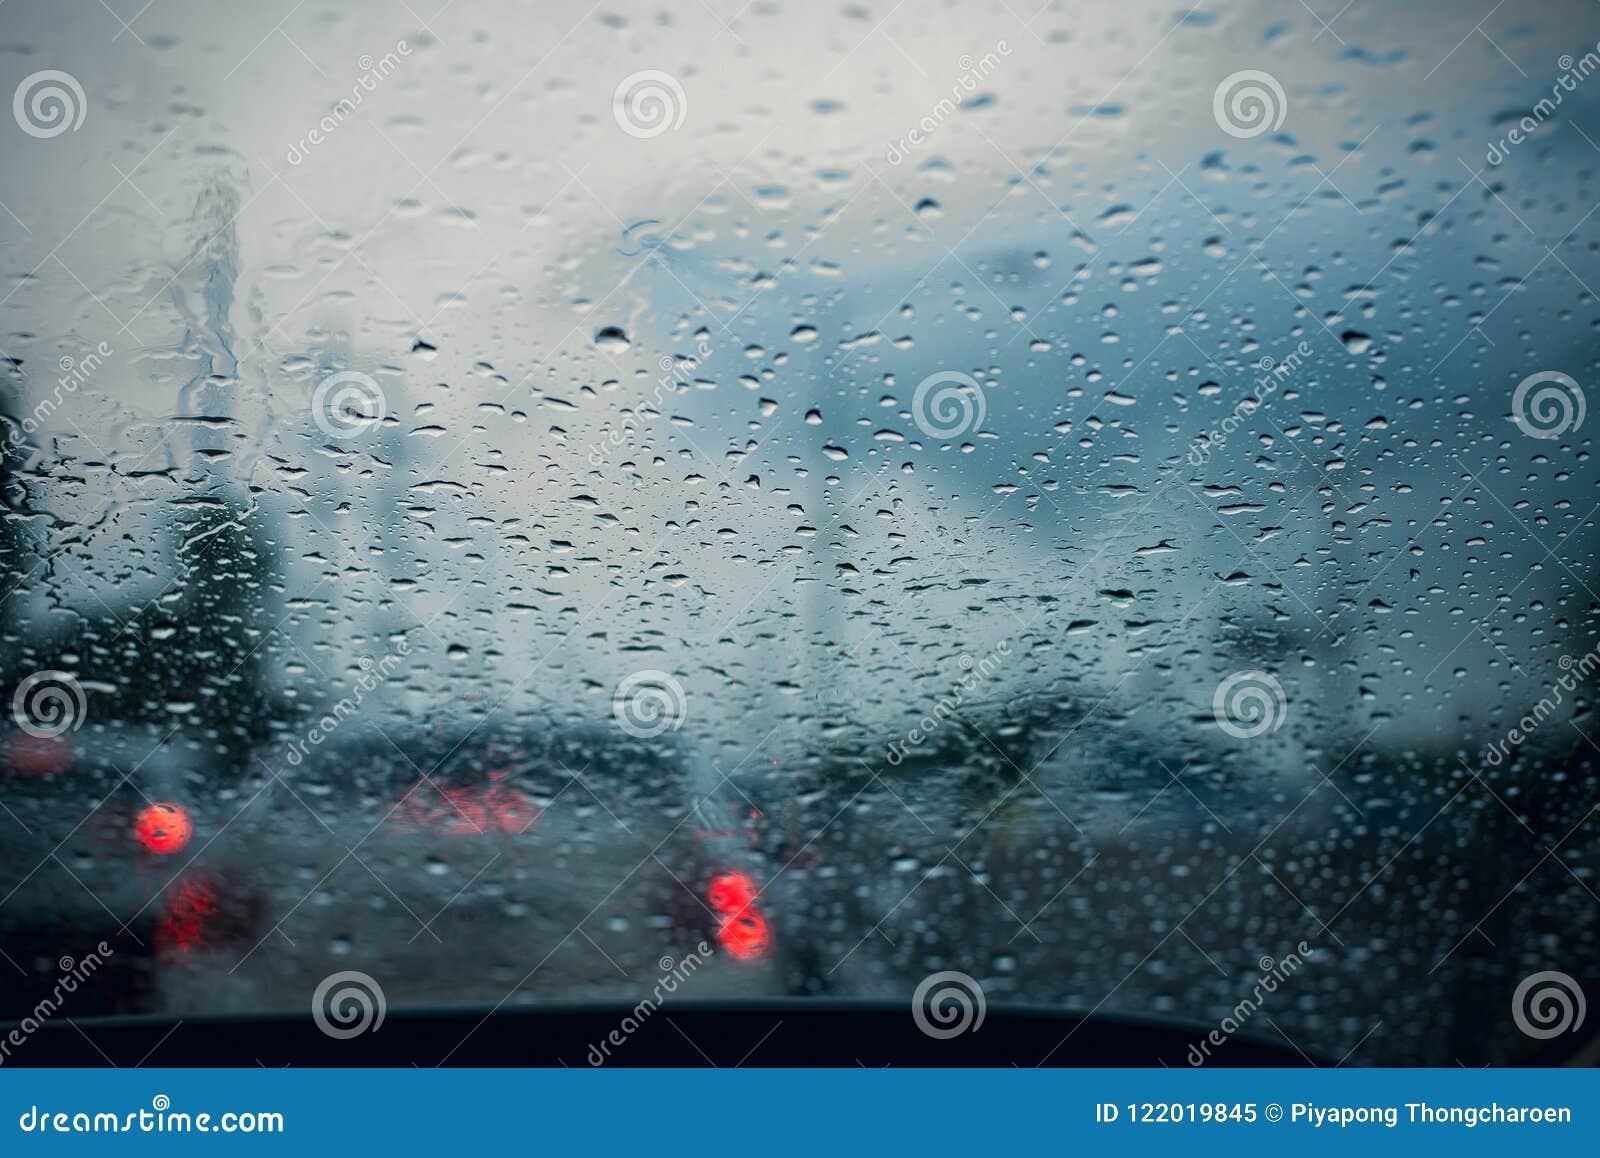 Bilfönstret med regn tappar på exponeringsglas eller vindrutan, suddig trafik på regnig dag i staden